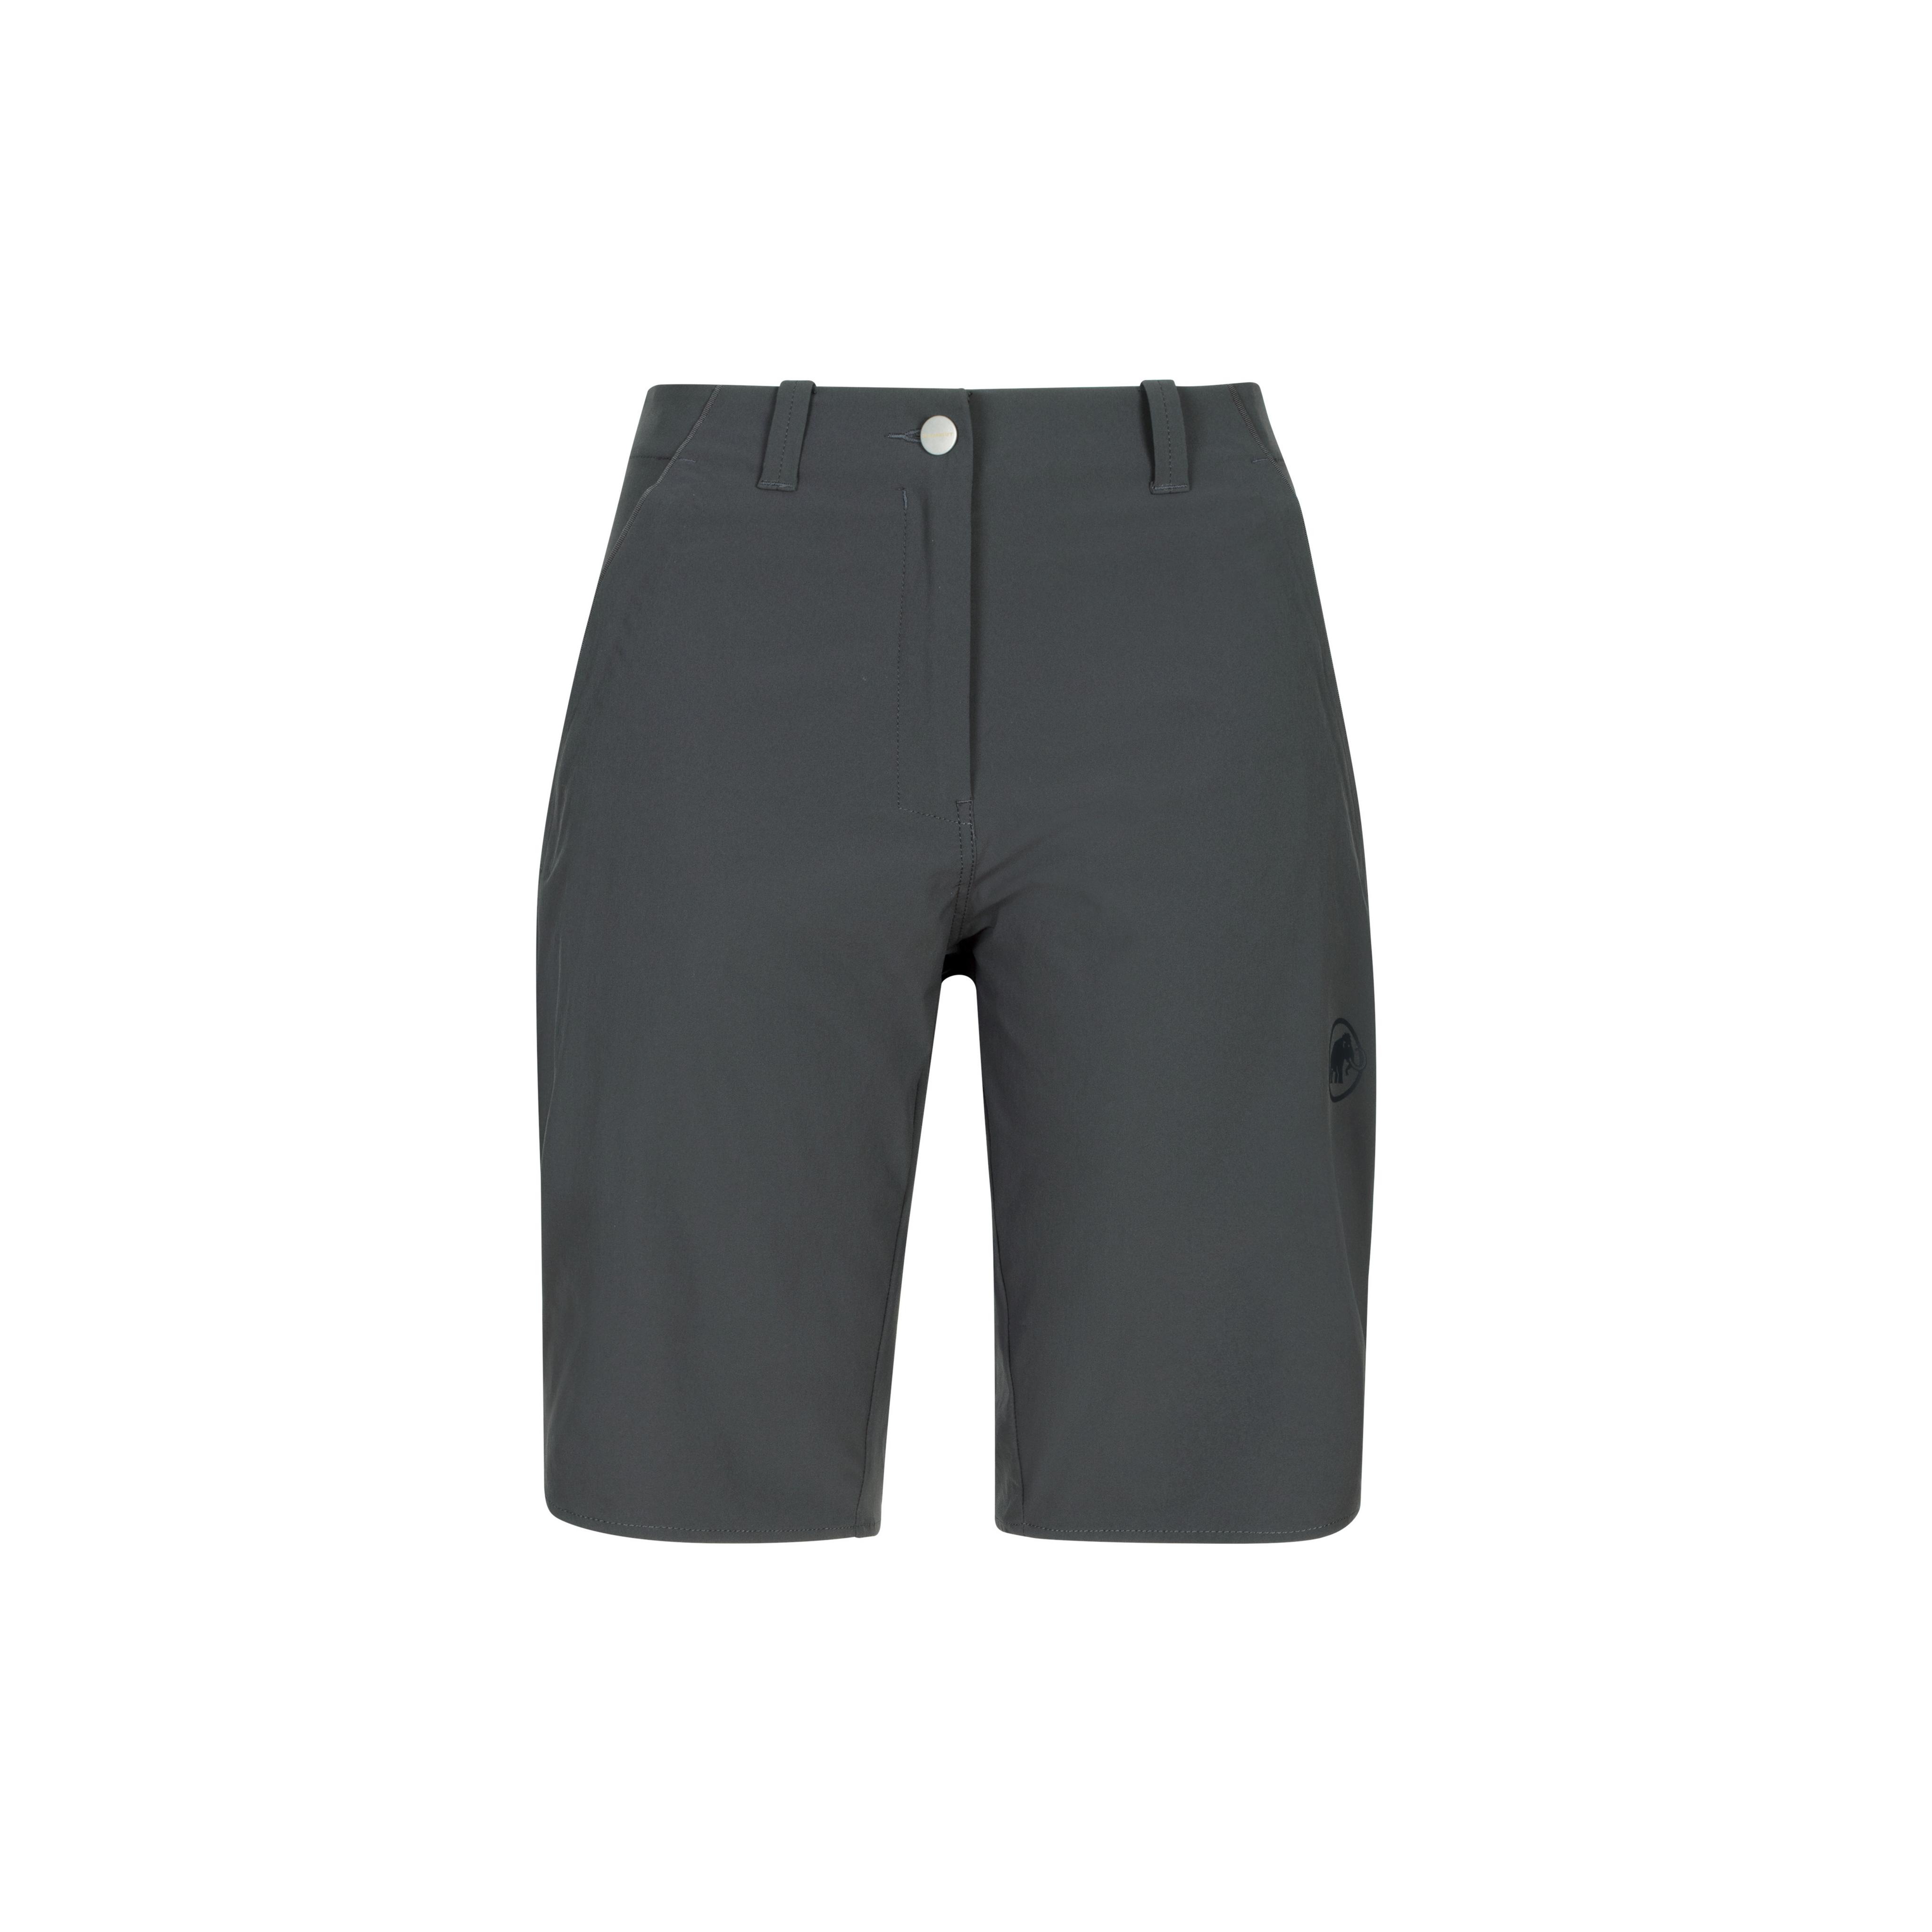 Runbold Shorts Women - phantom, UK 6 thumbnail